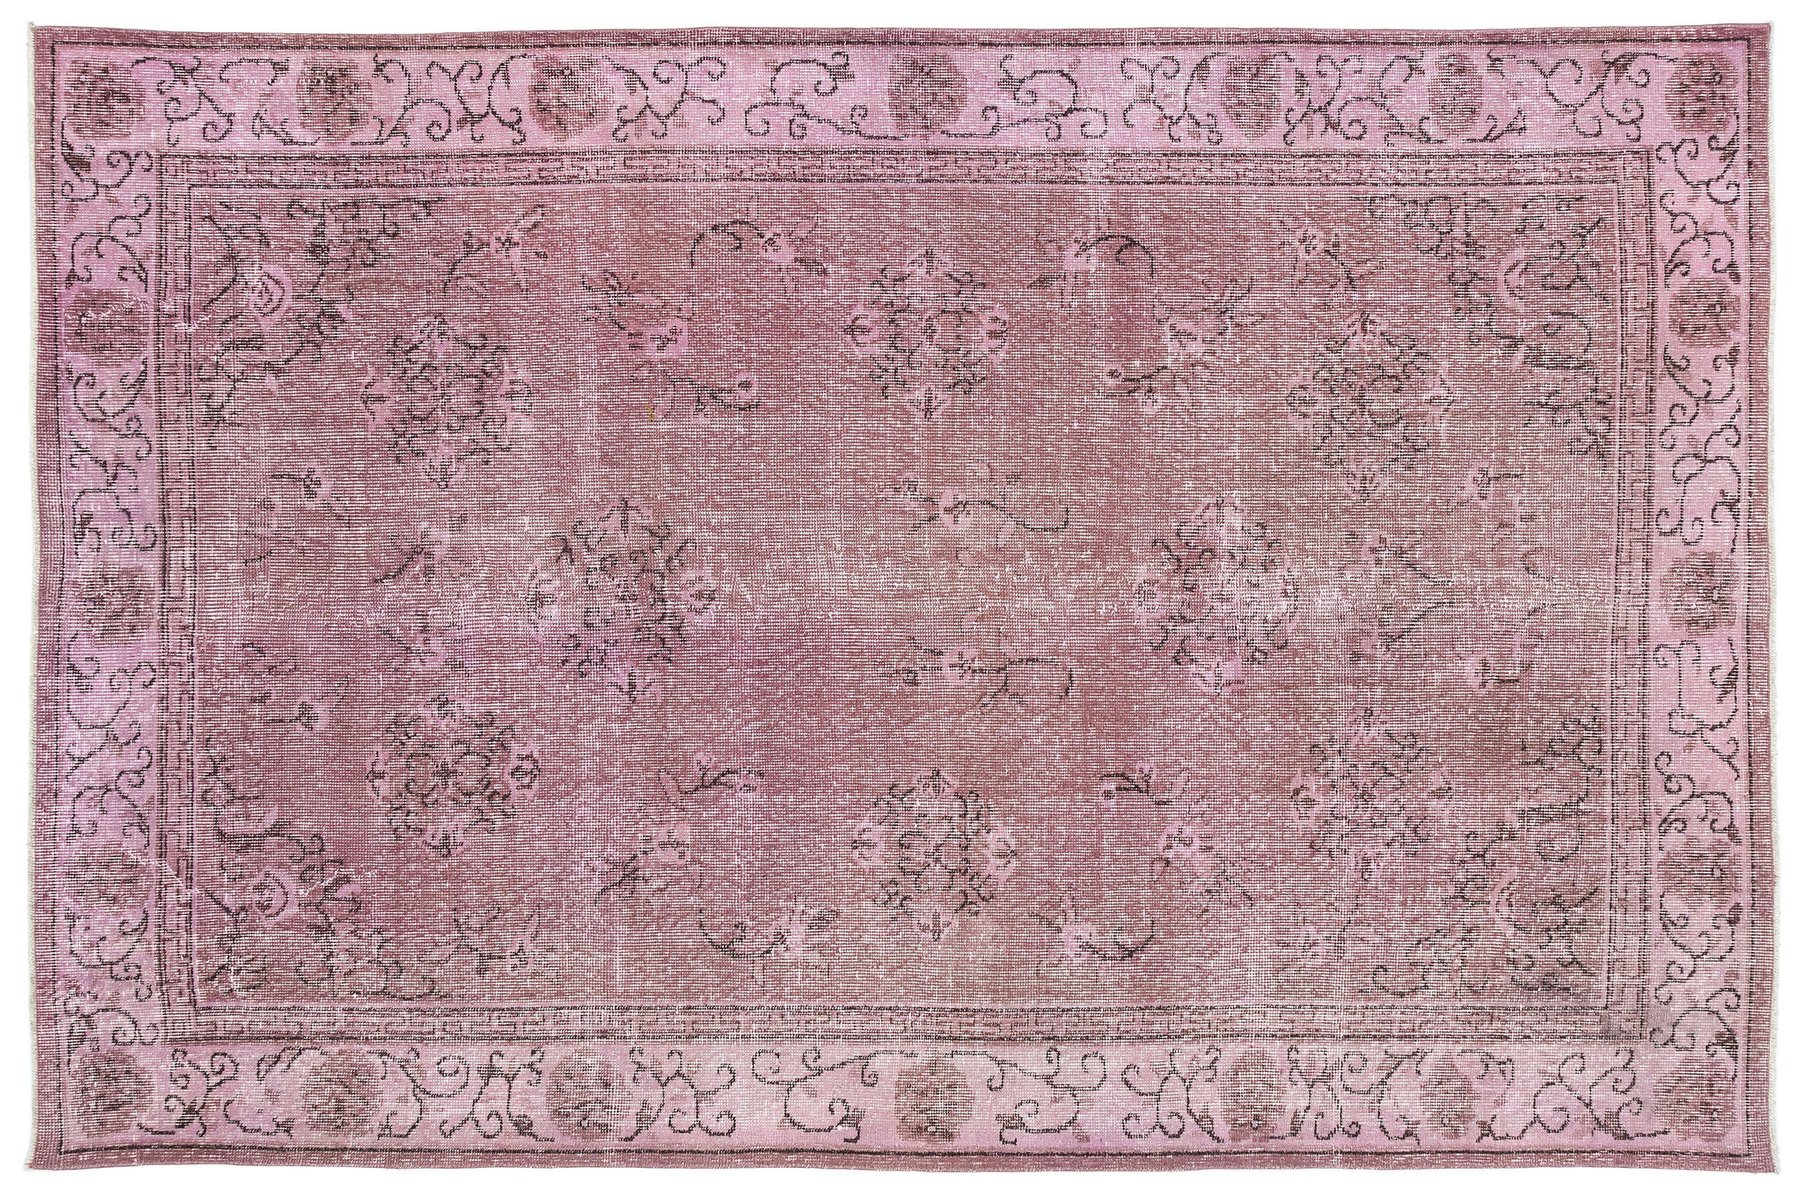 Vintage Turkish Pink Overdyed Rug